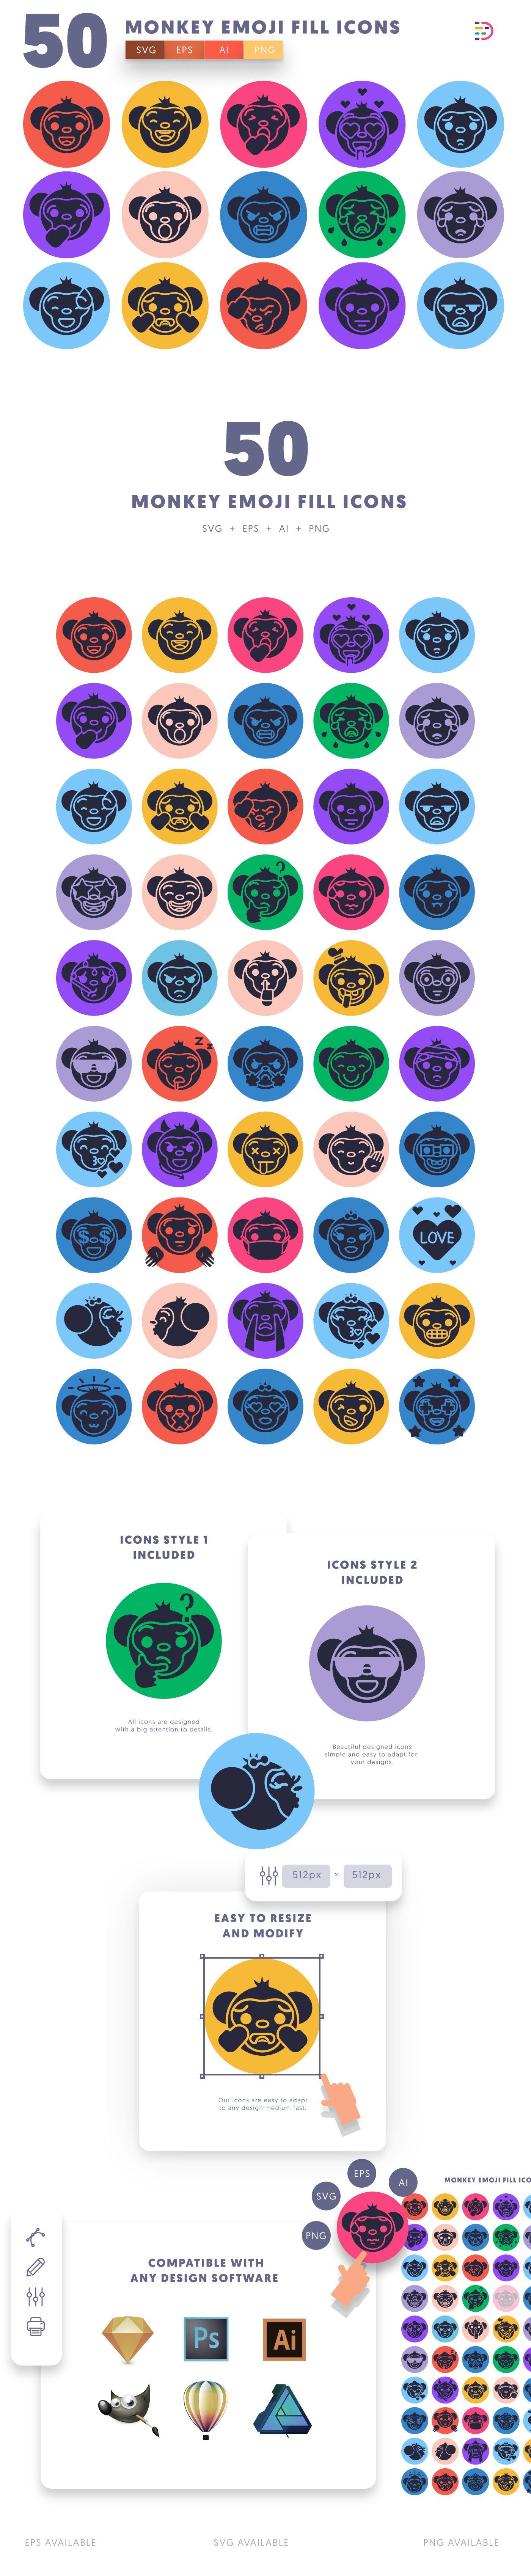 Monkey Emoji Fill icons info graphic